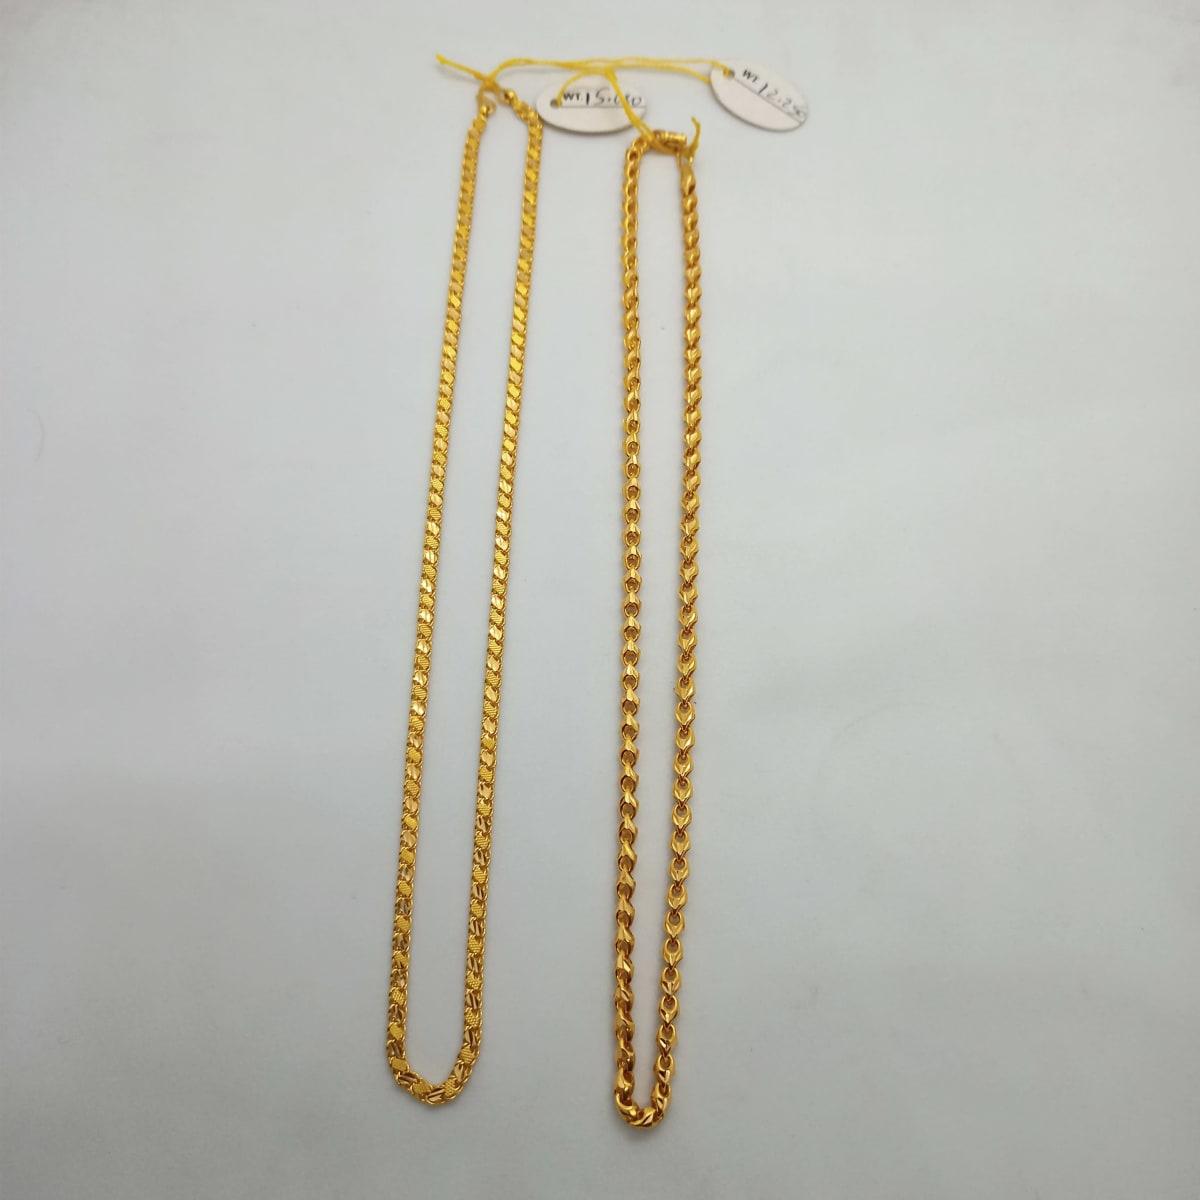 Fancy Chains For Men